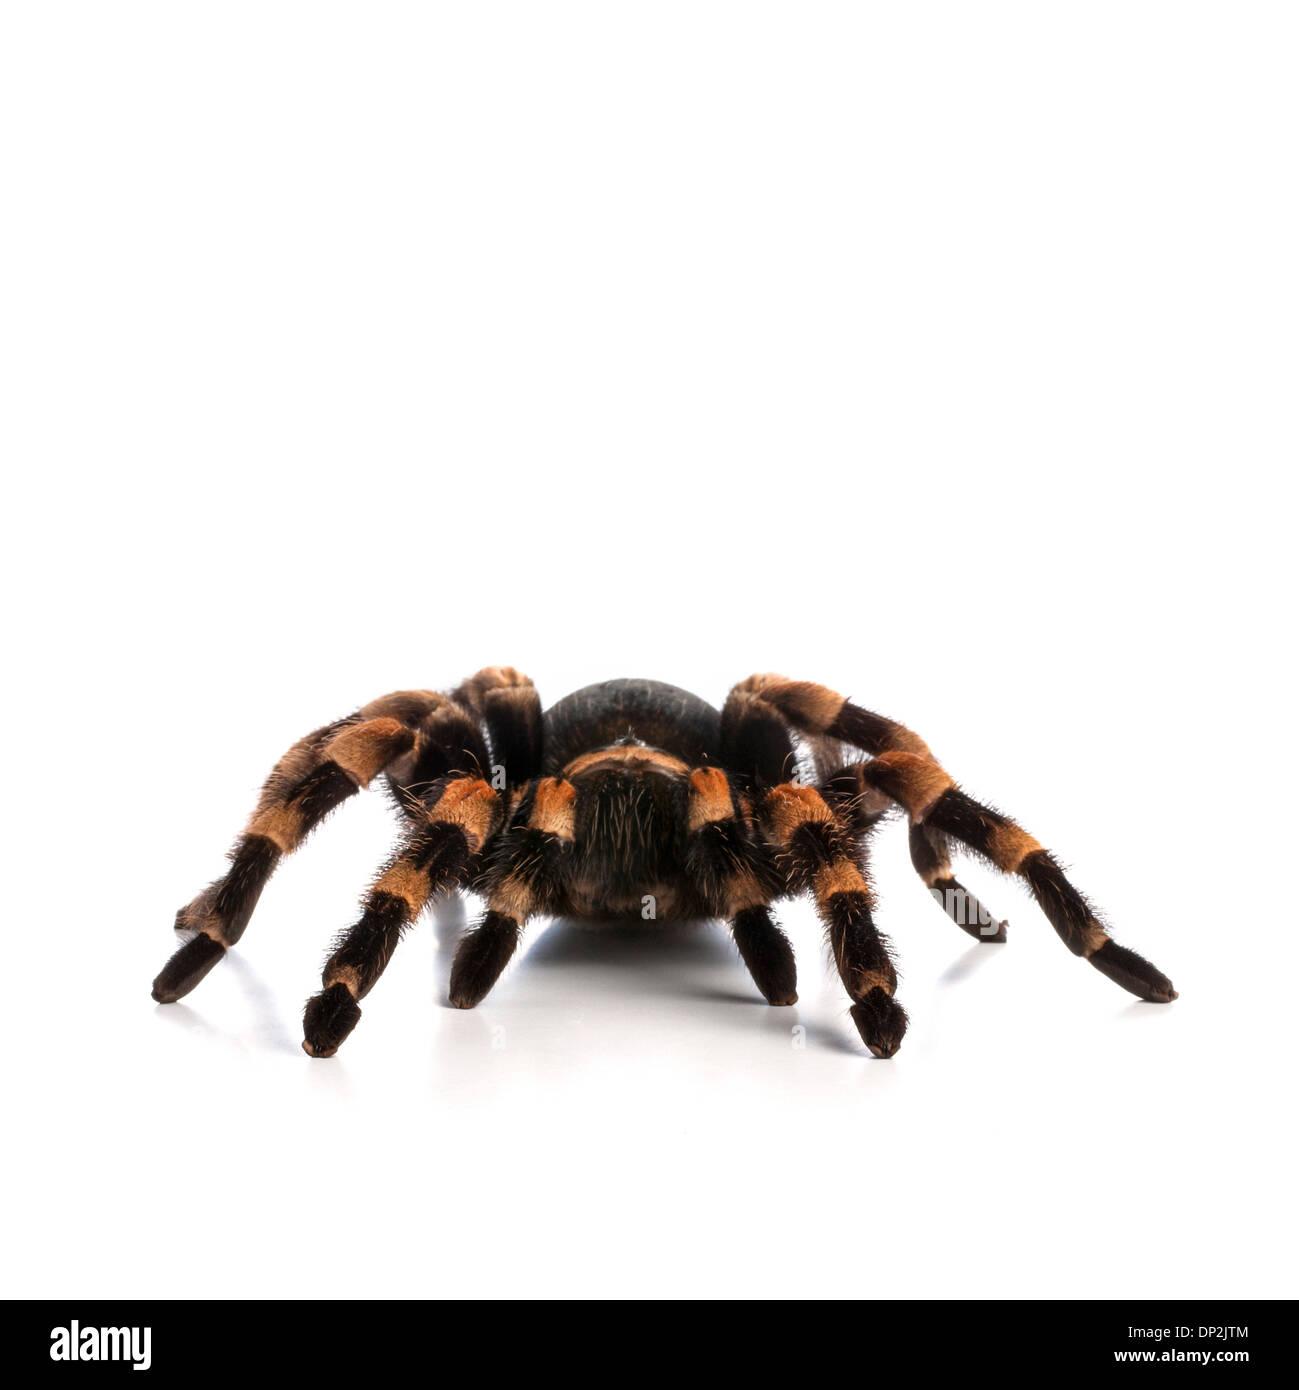 Mexican redknee tarantula - Stock Image